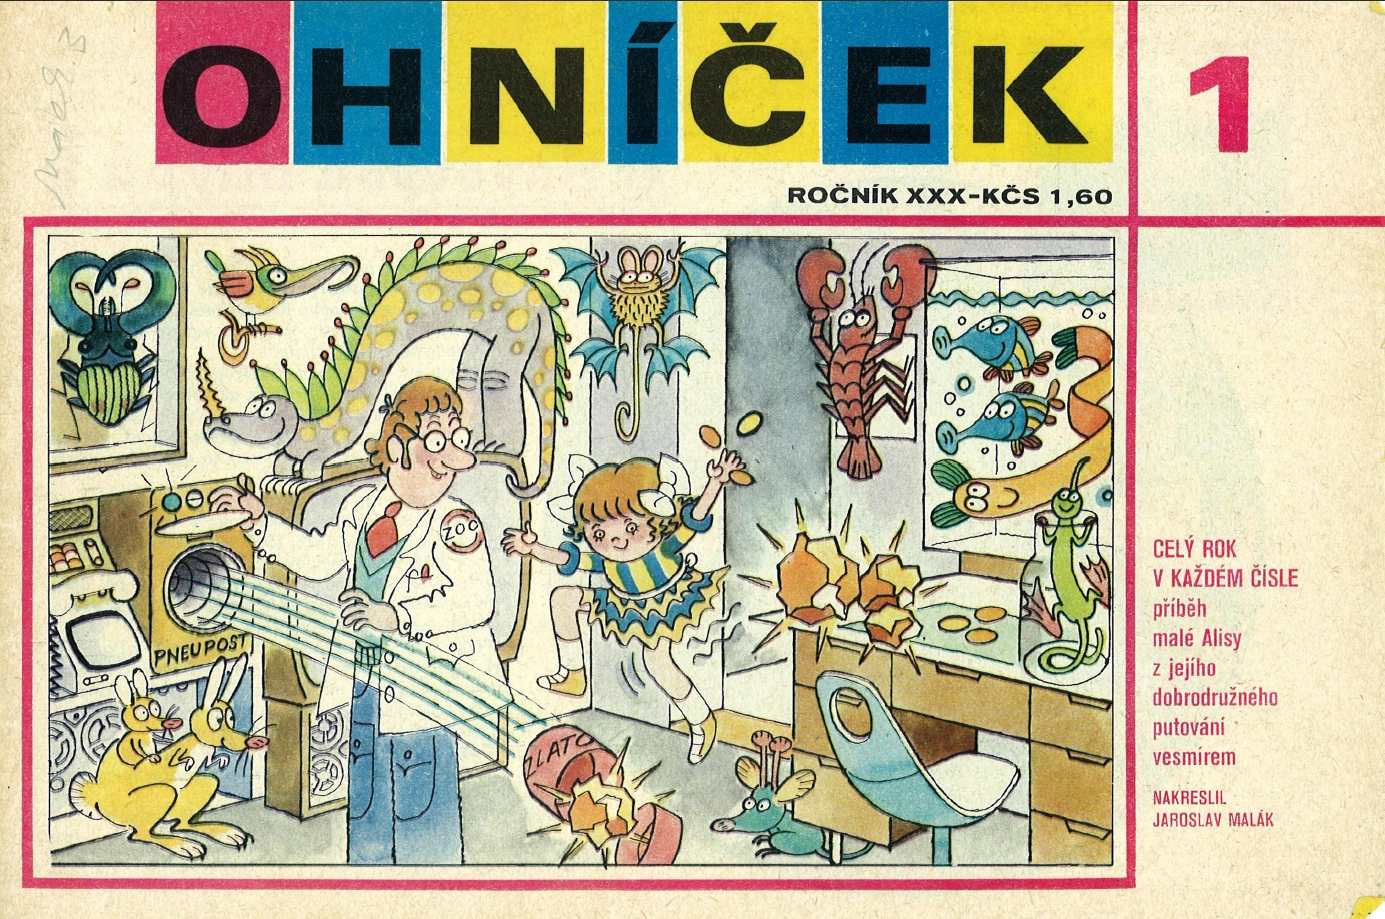 OHNÍČEK_30_(1979-80)_01